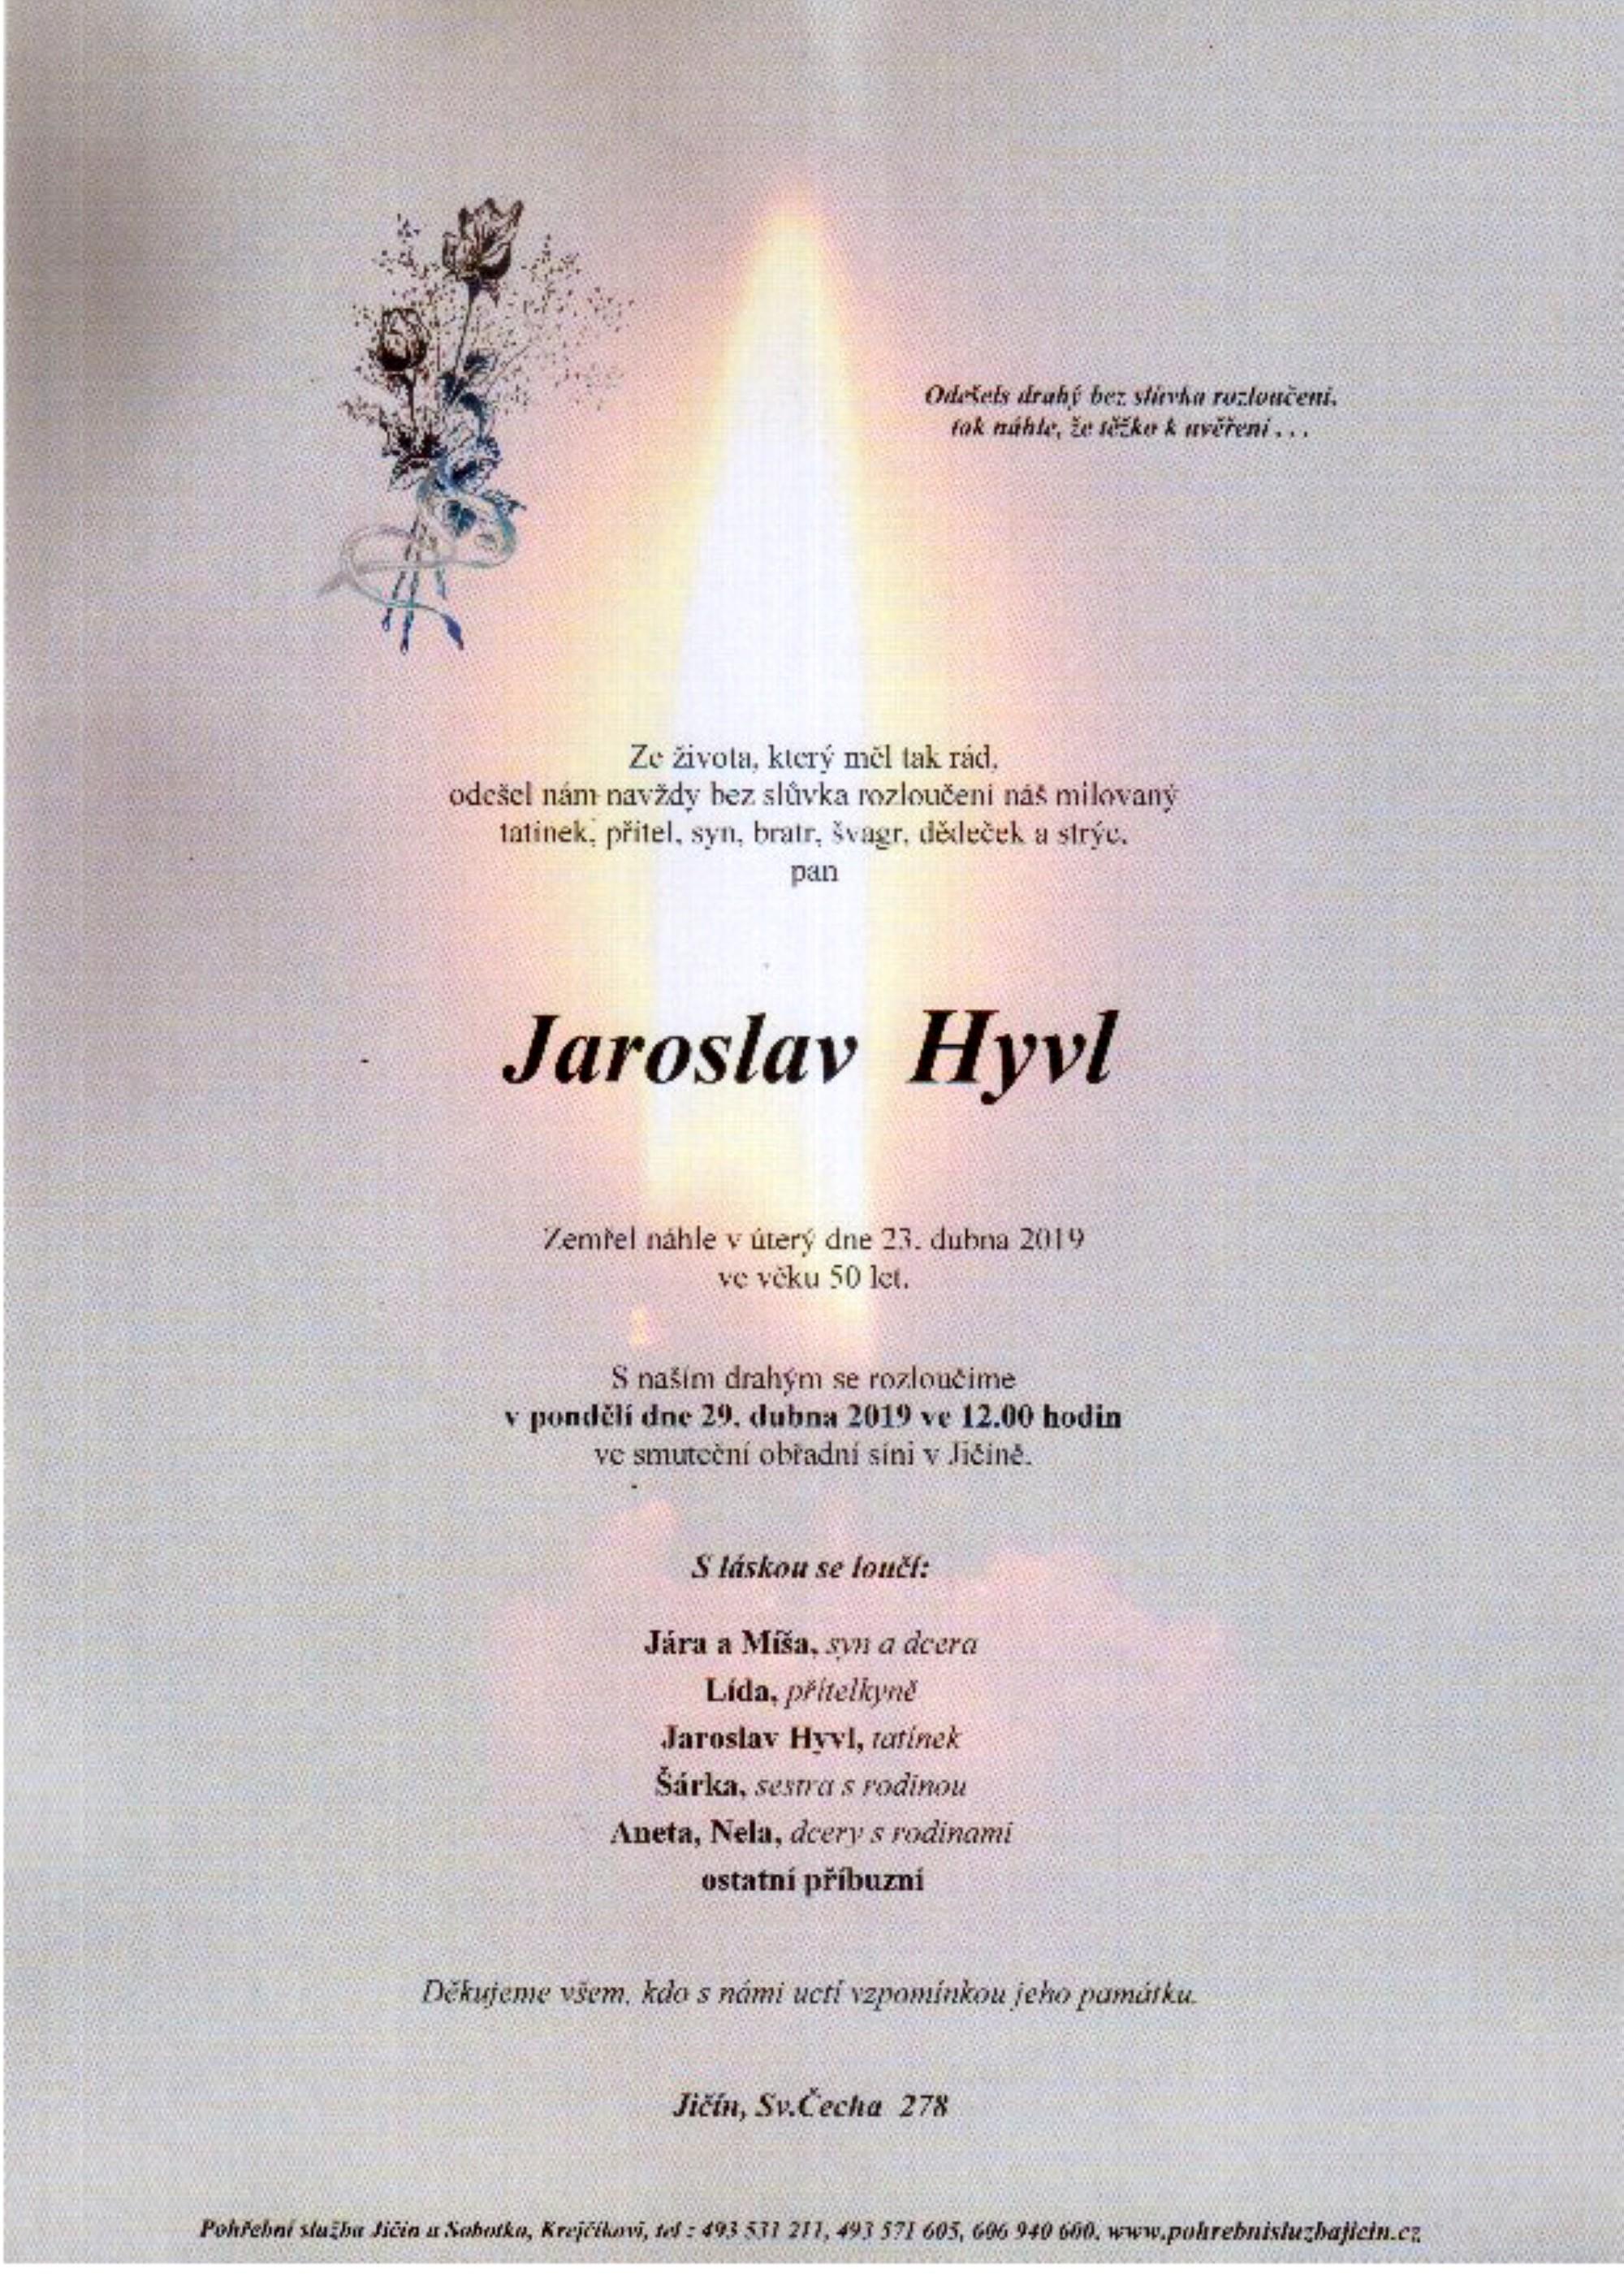 Jaroslav Hyvl